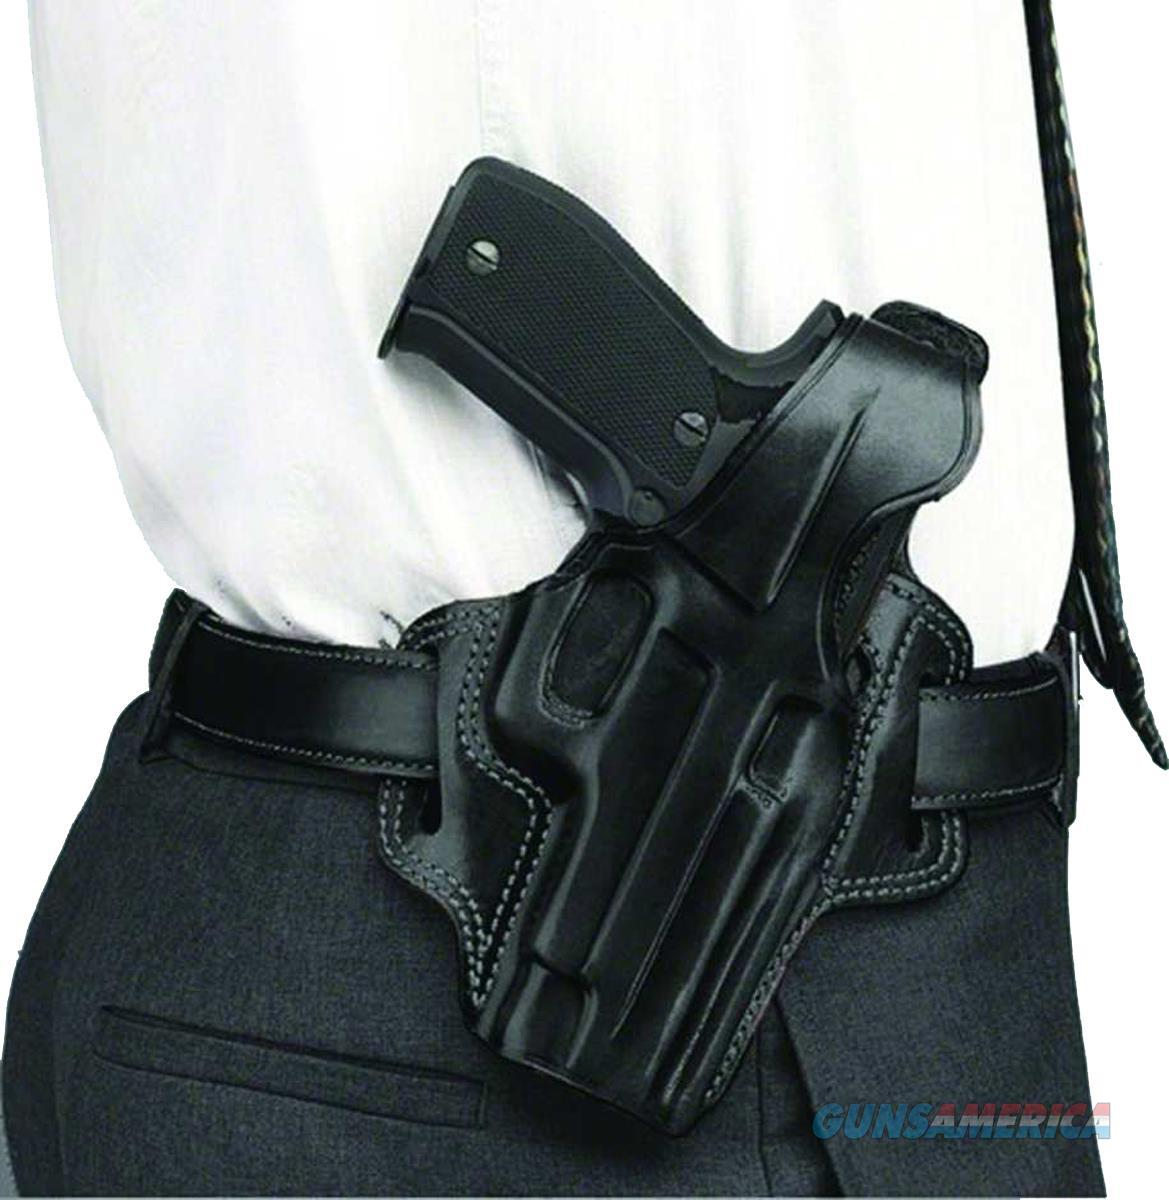 Galco Fl224b Fletch High Ride  Glock 17 Steerhide Black FL224B  Non-Guns > Holsters and Gunleather > Other